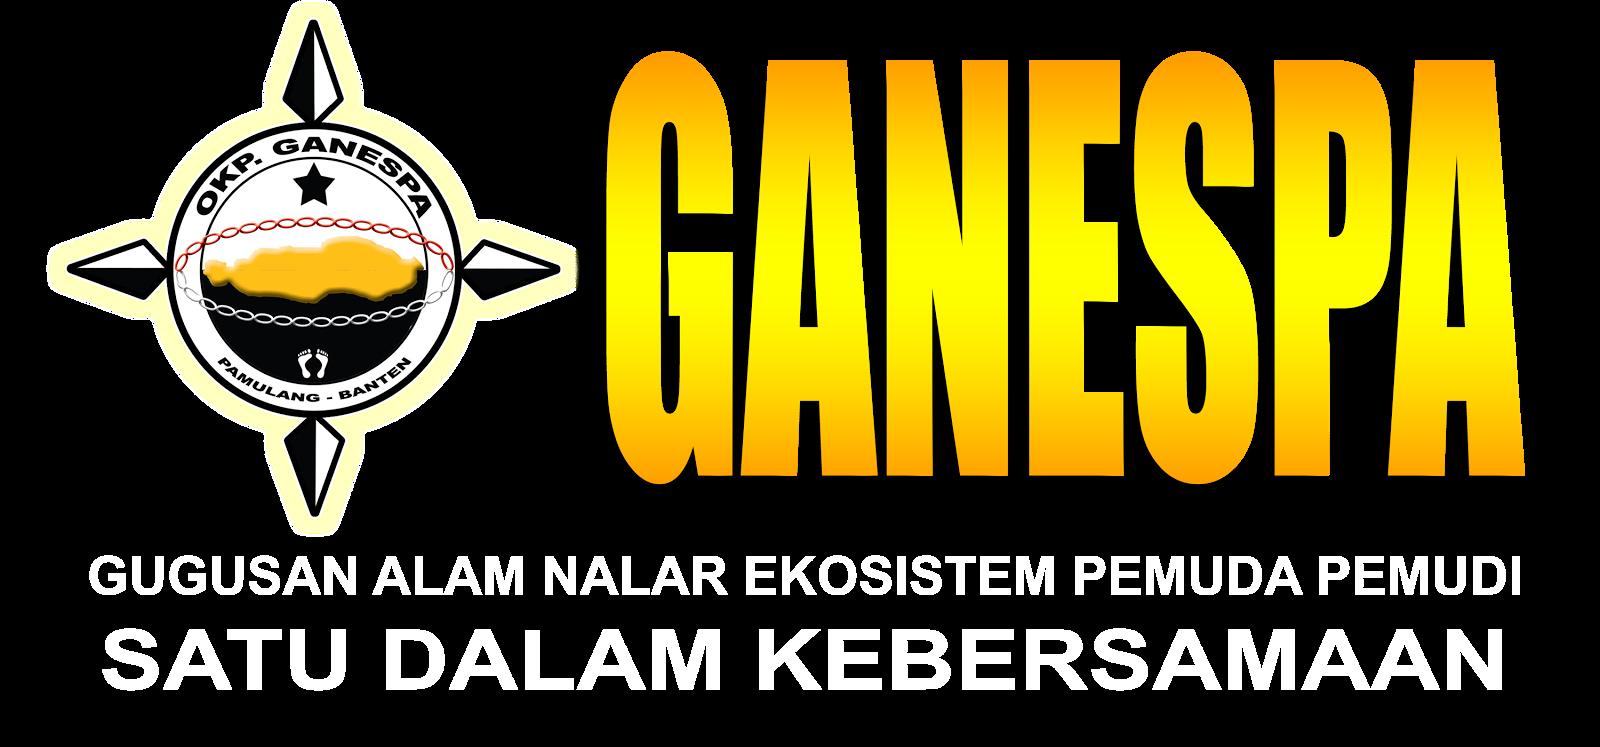 GANESPA